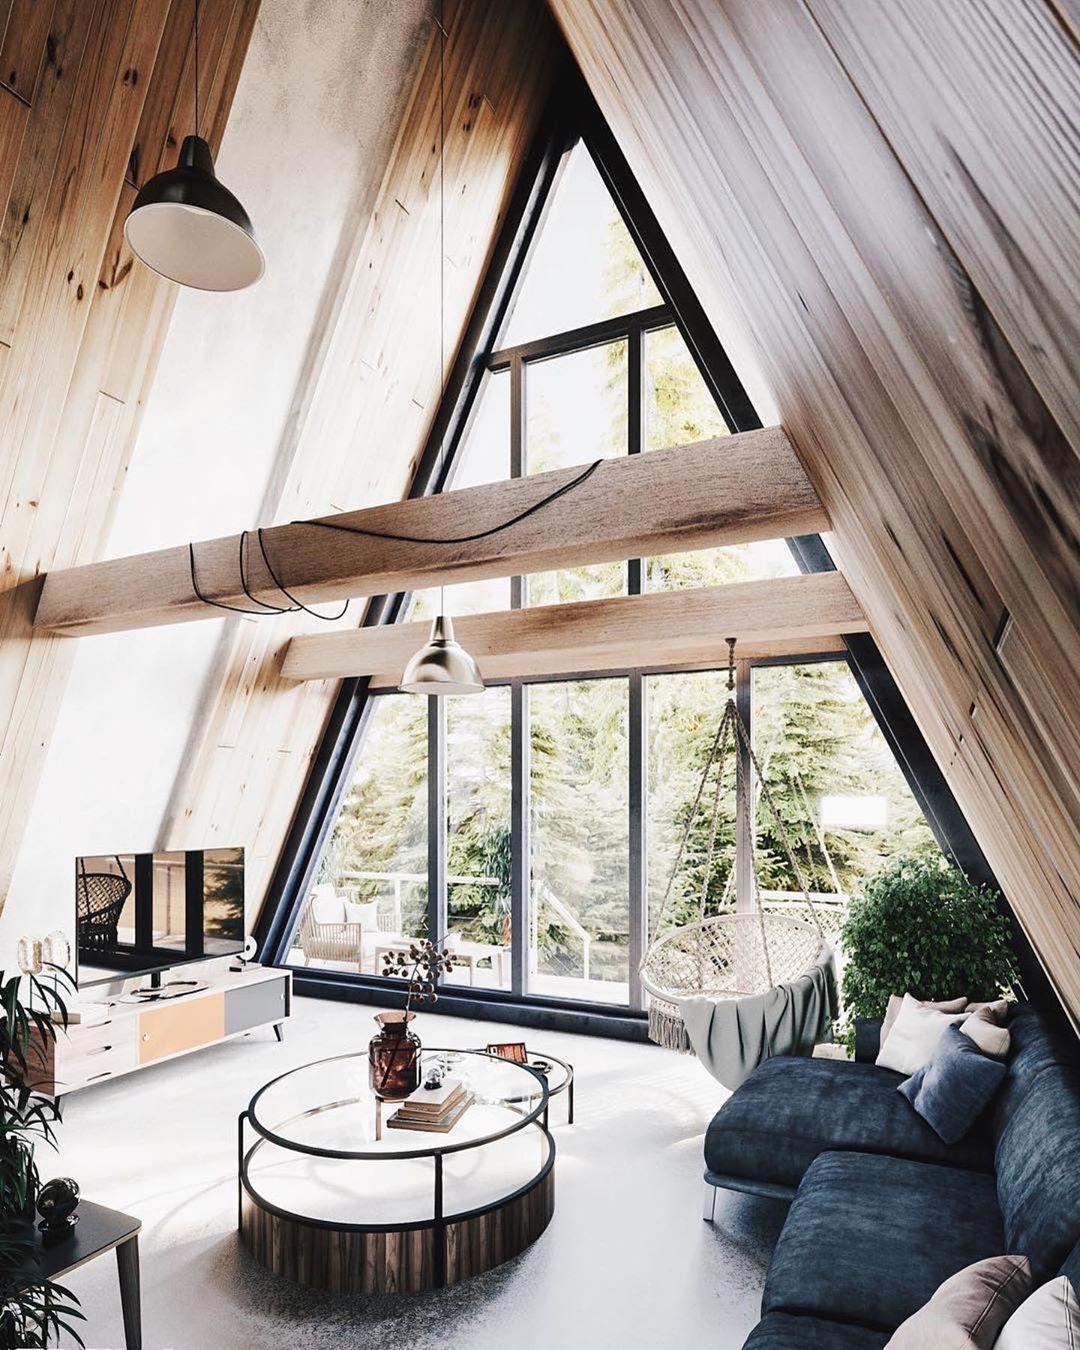 Wood Interior Design Ideas On Instagram Kak Vam Dizajn This Cabin Is Visualized For Sk Architekci The Vi A Frame House Cabin Design Home